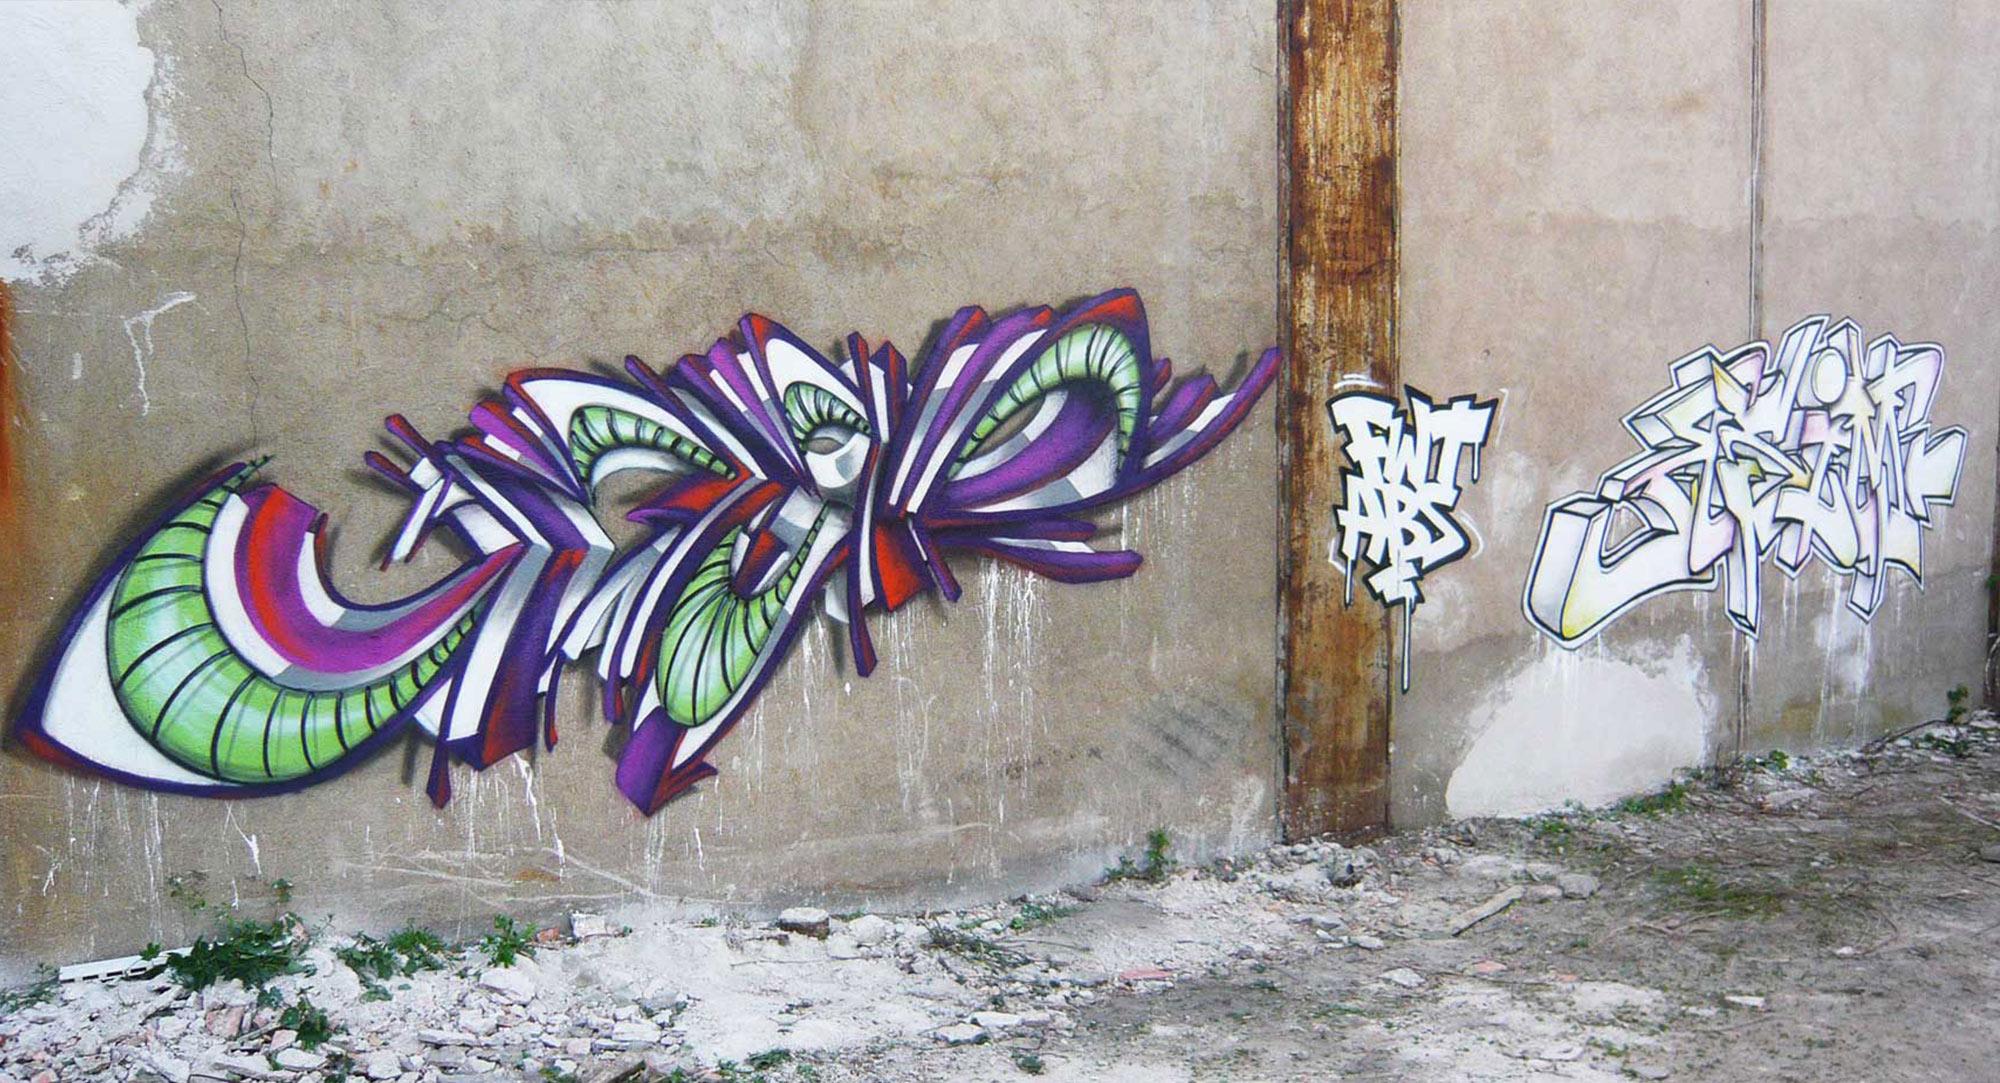 Deft & Miser  - Graffiti